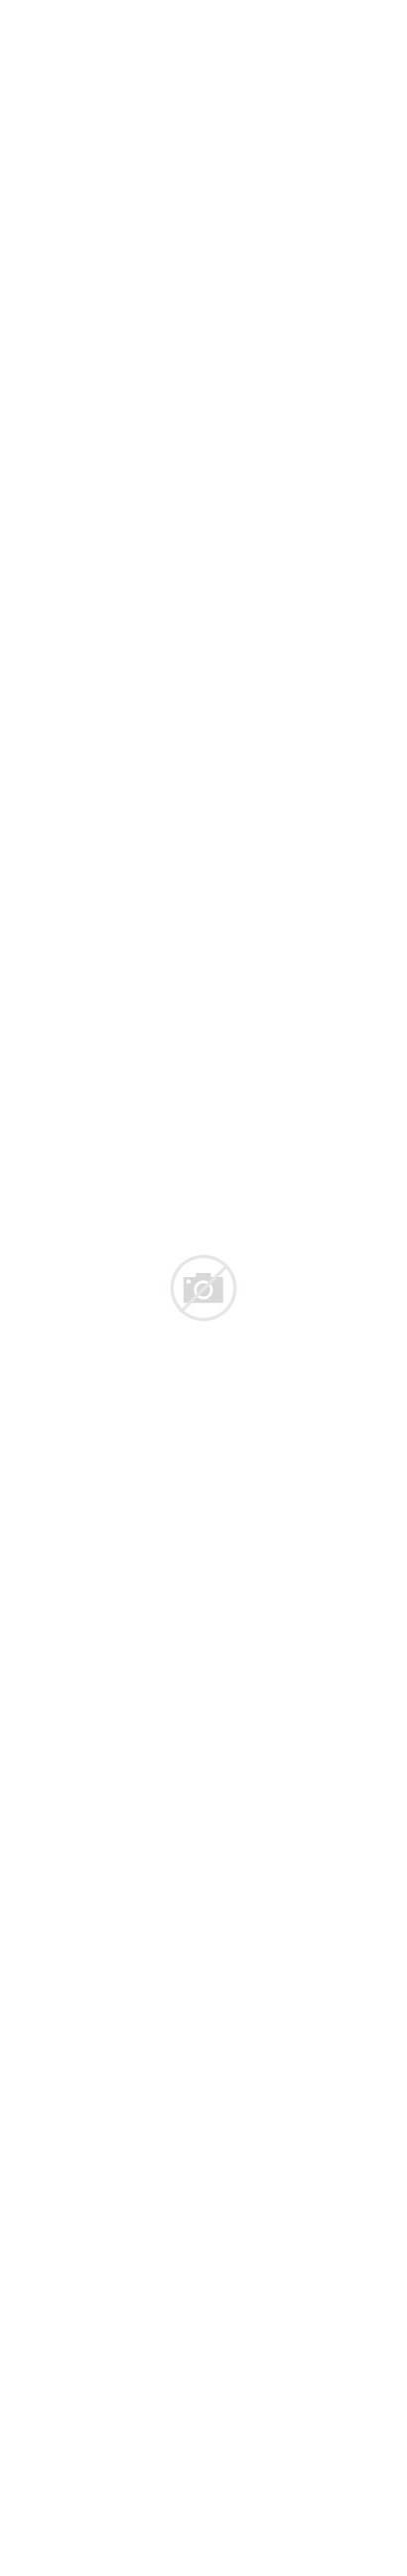 Tower Freedom Trade Center Update Deviantart Drawings